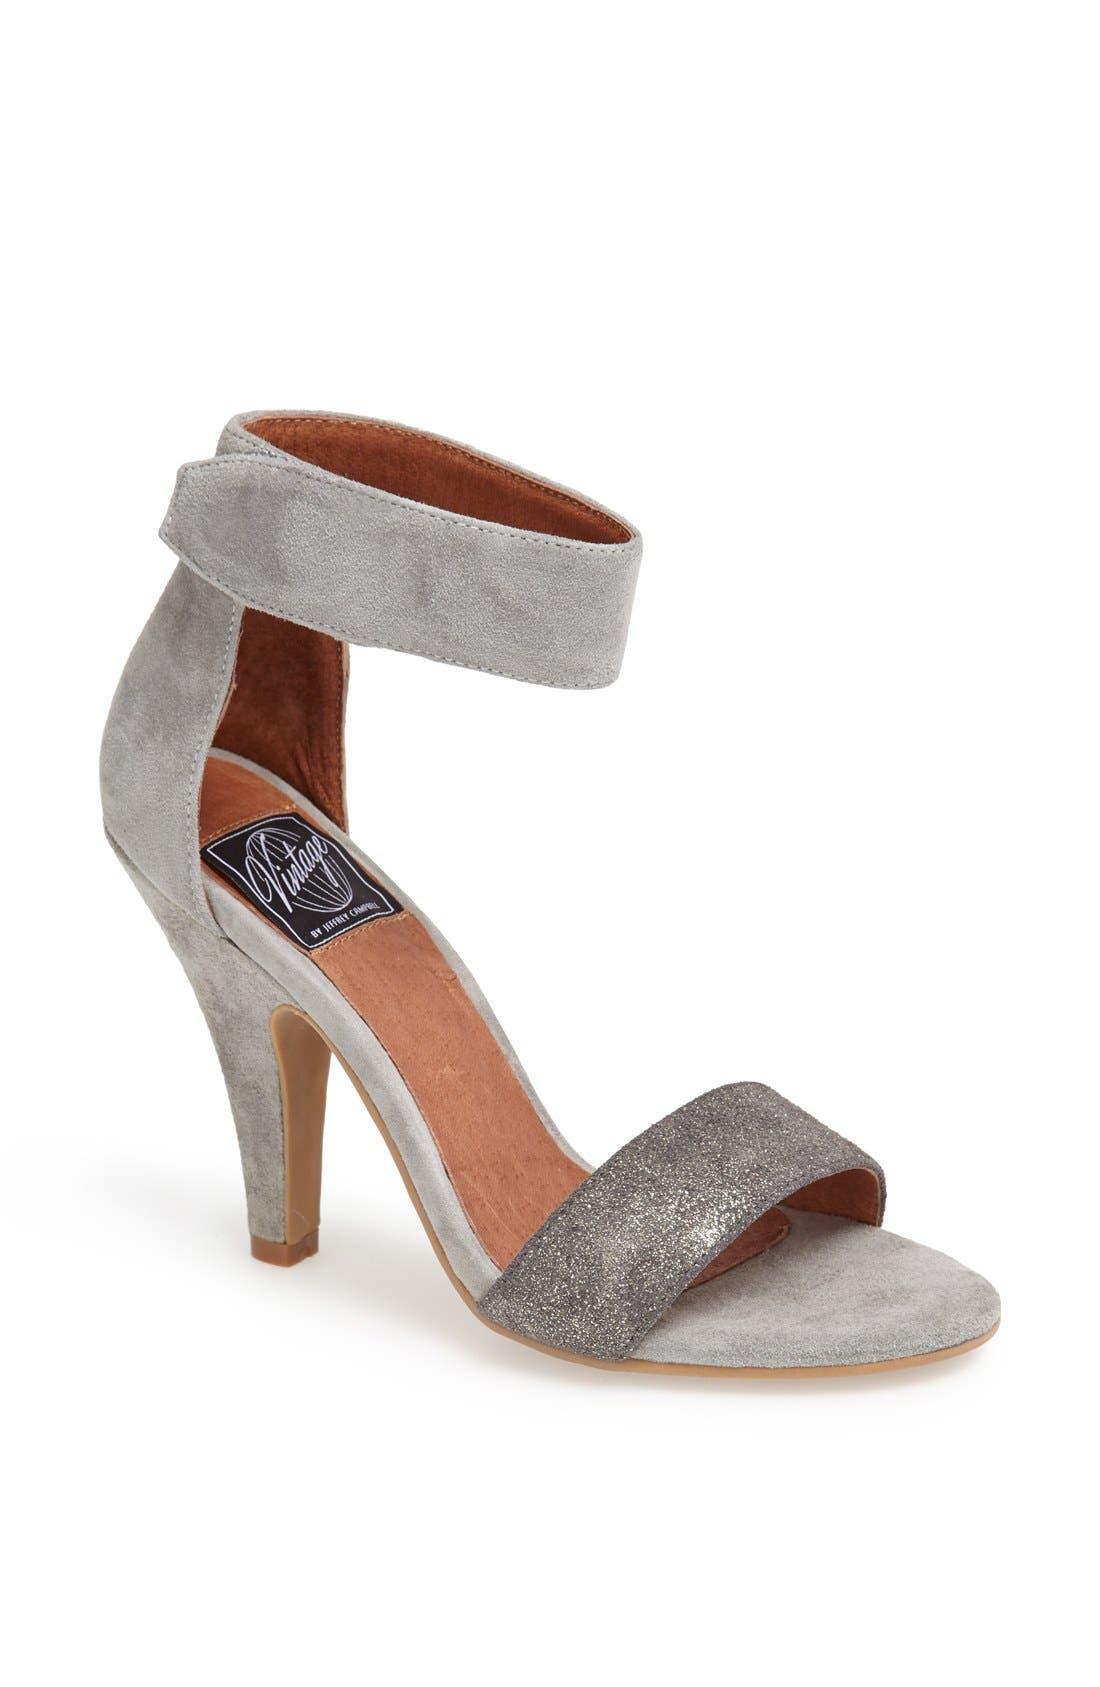 Main Image - Jeffrey Campbell 'Foxtrot' Sandal